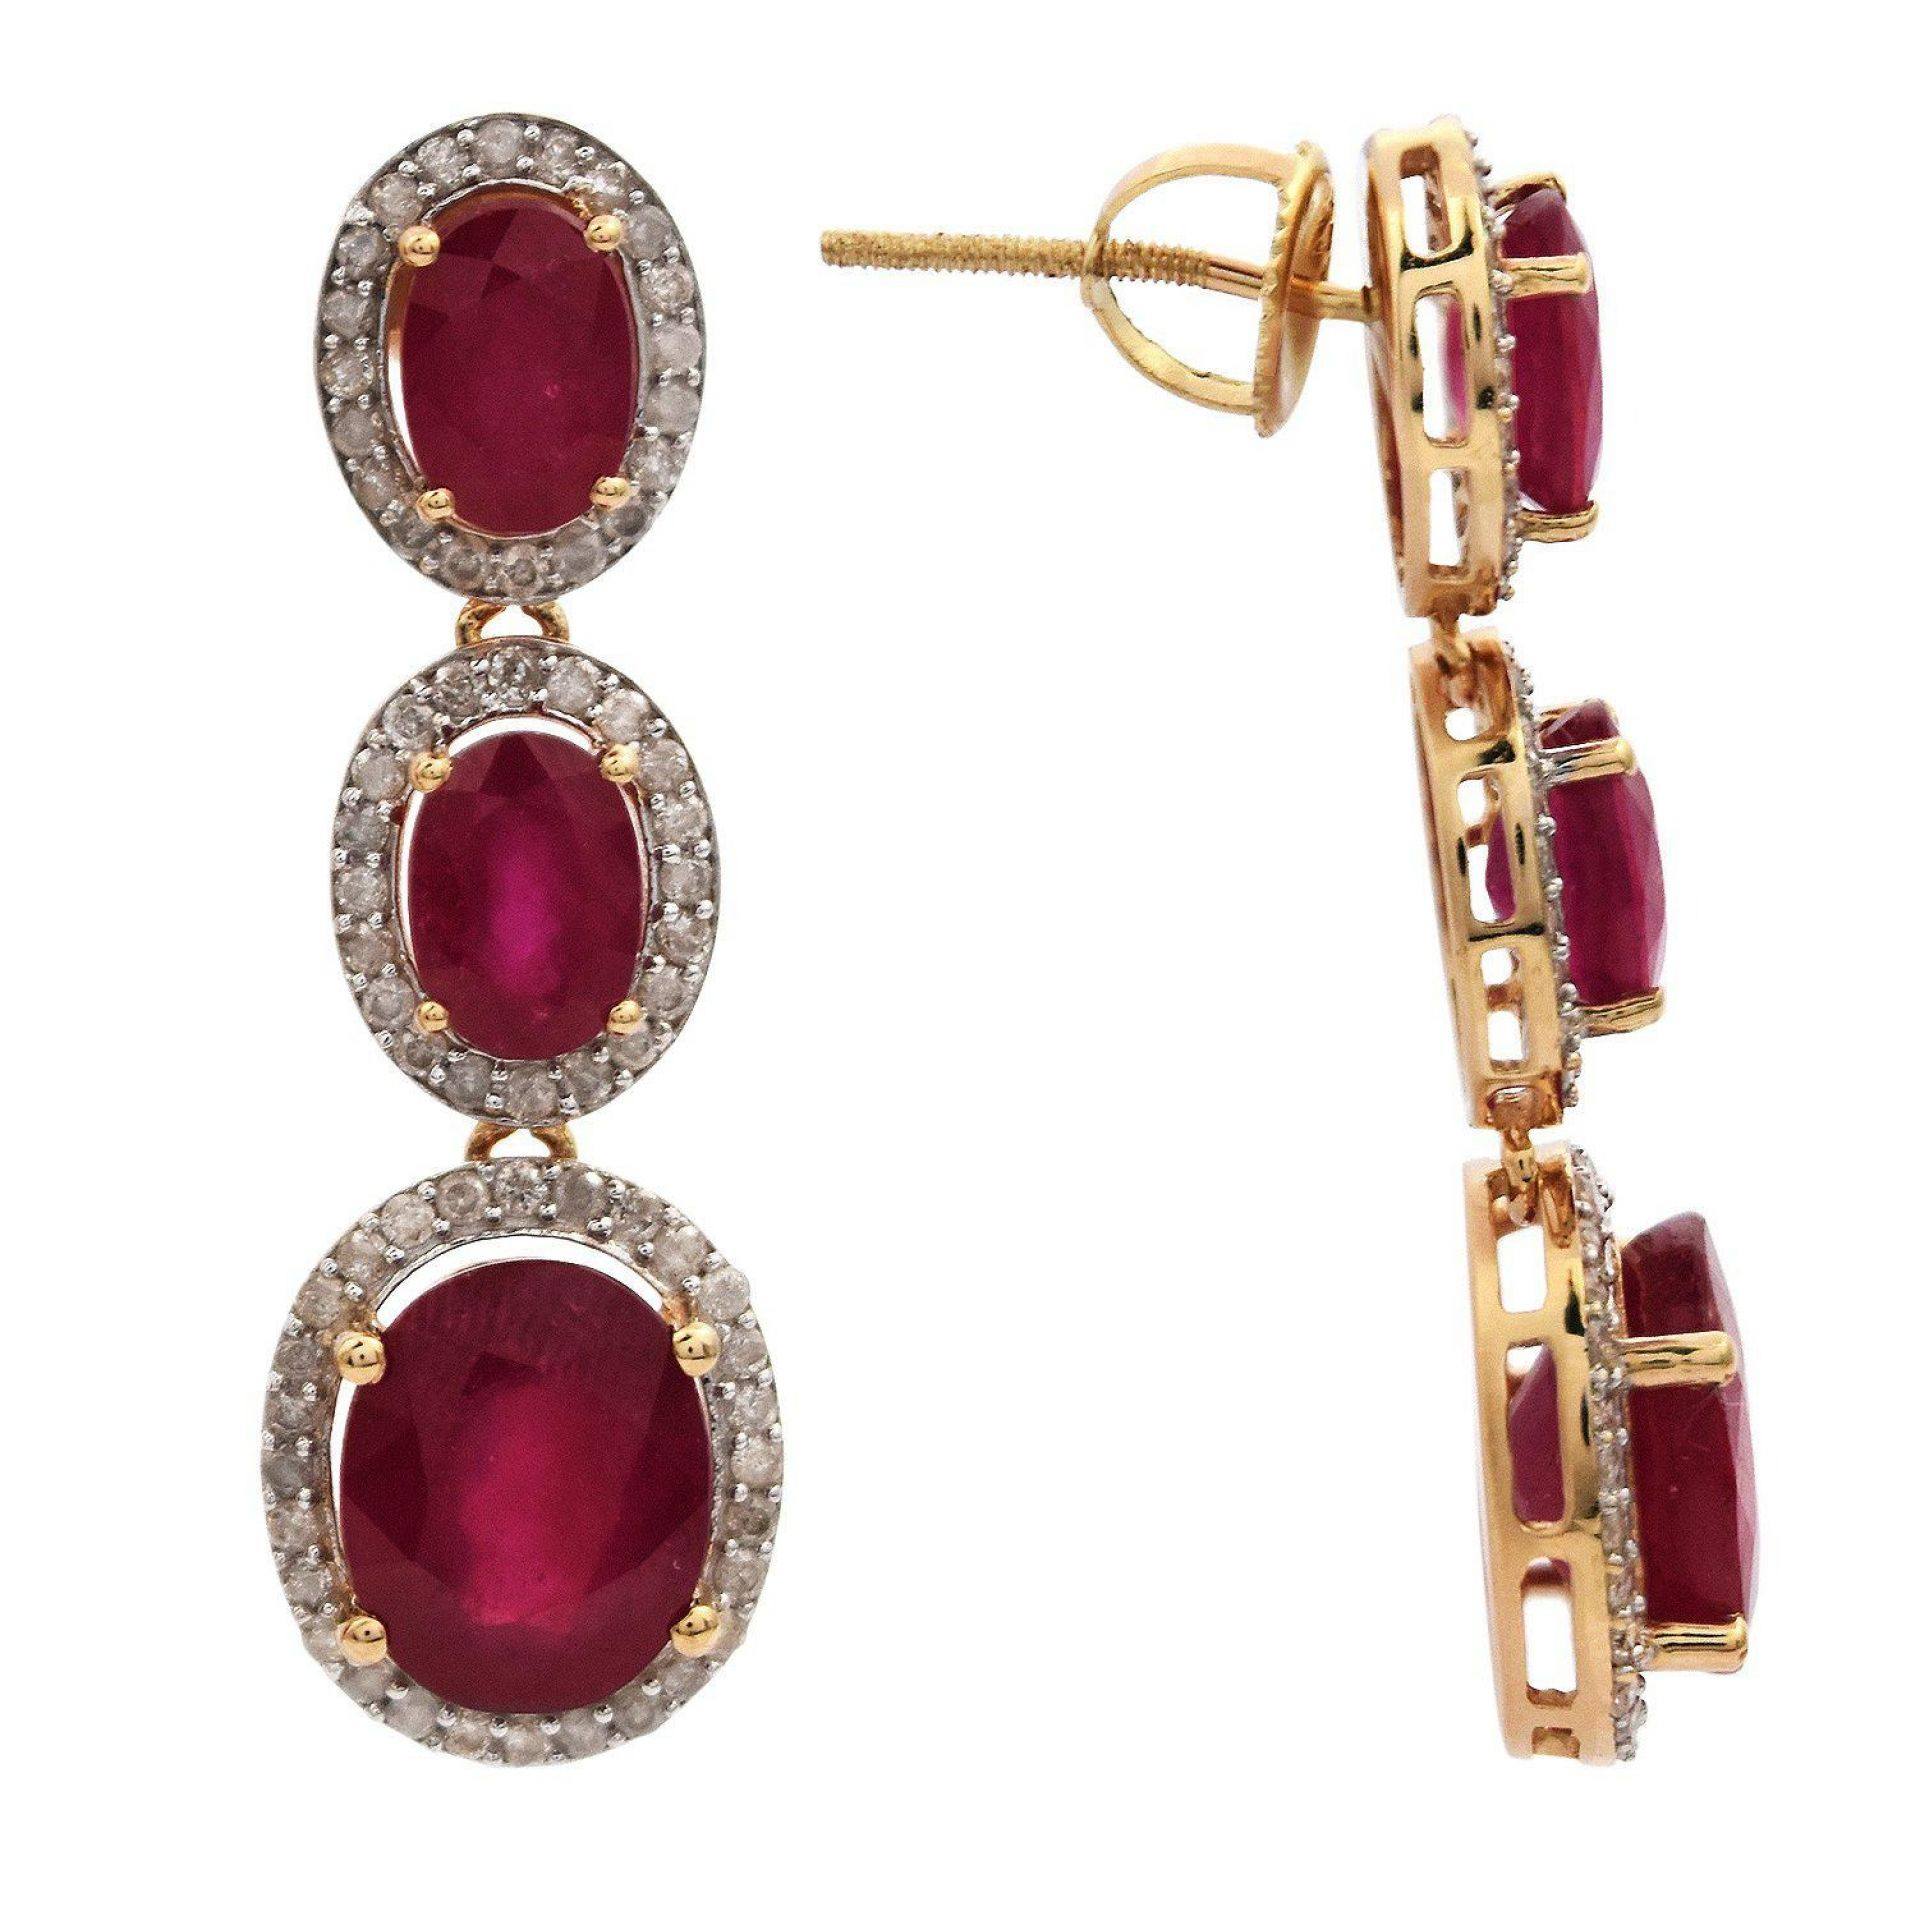 12.96ctw Ruby and 1.04ctw Diamond Dangle Earrings